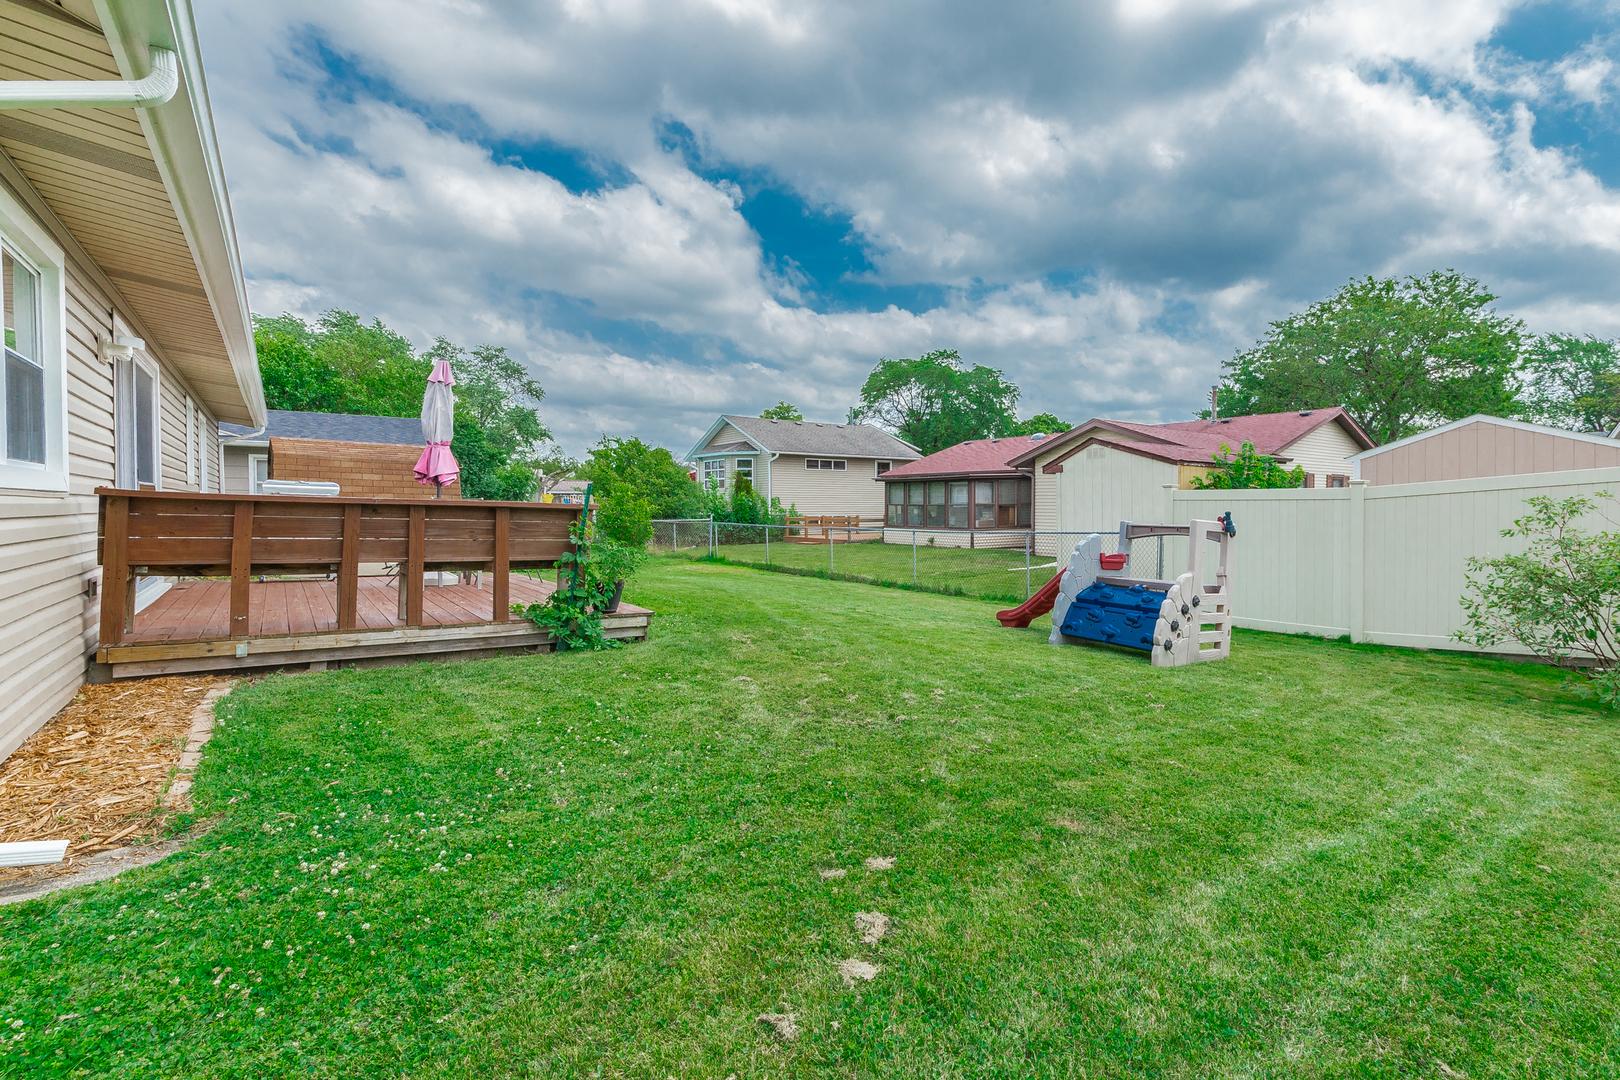 51 CLEARMONT, ELK GROVE VILLAGE, Illinois, 60007